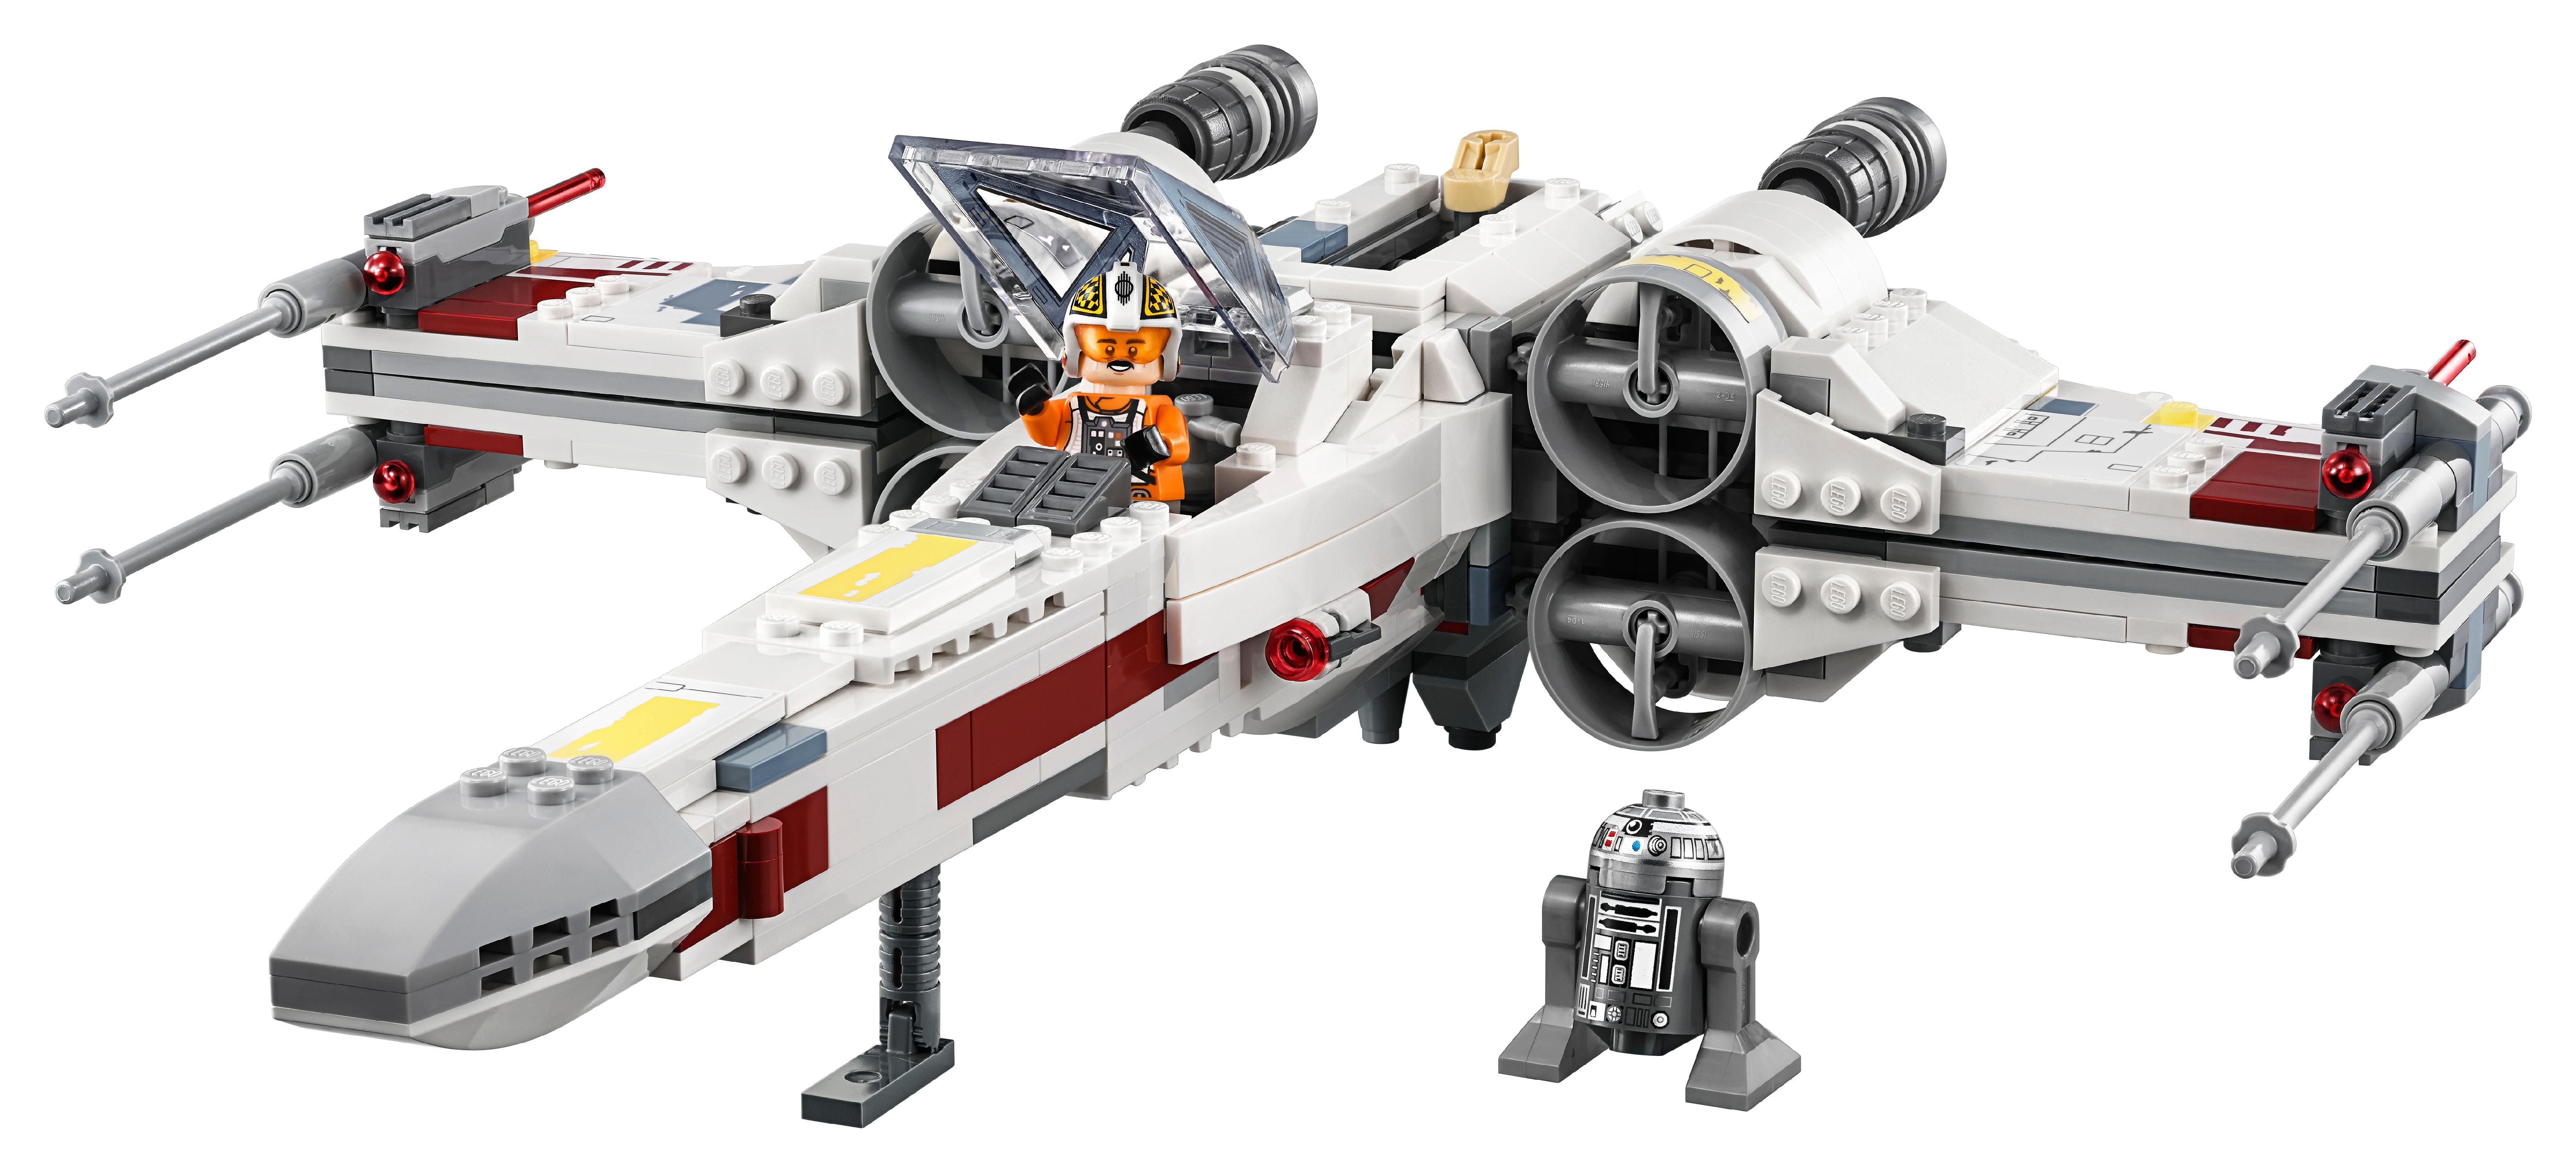 LEGO Star Wars X-Wing Starfighter 75218 Building Set - Walmart.com